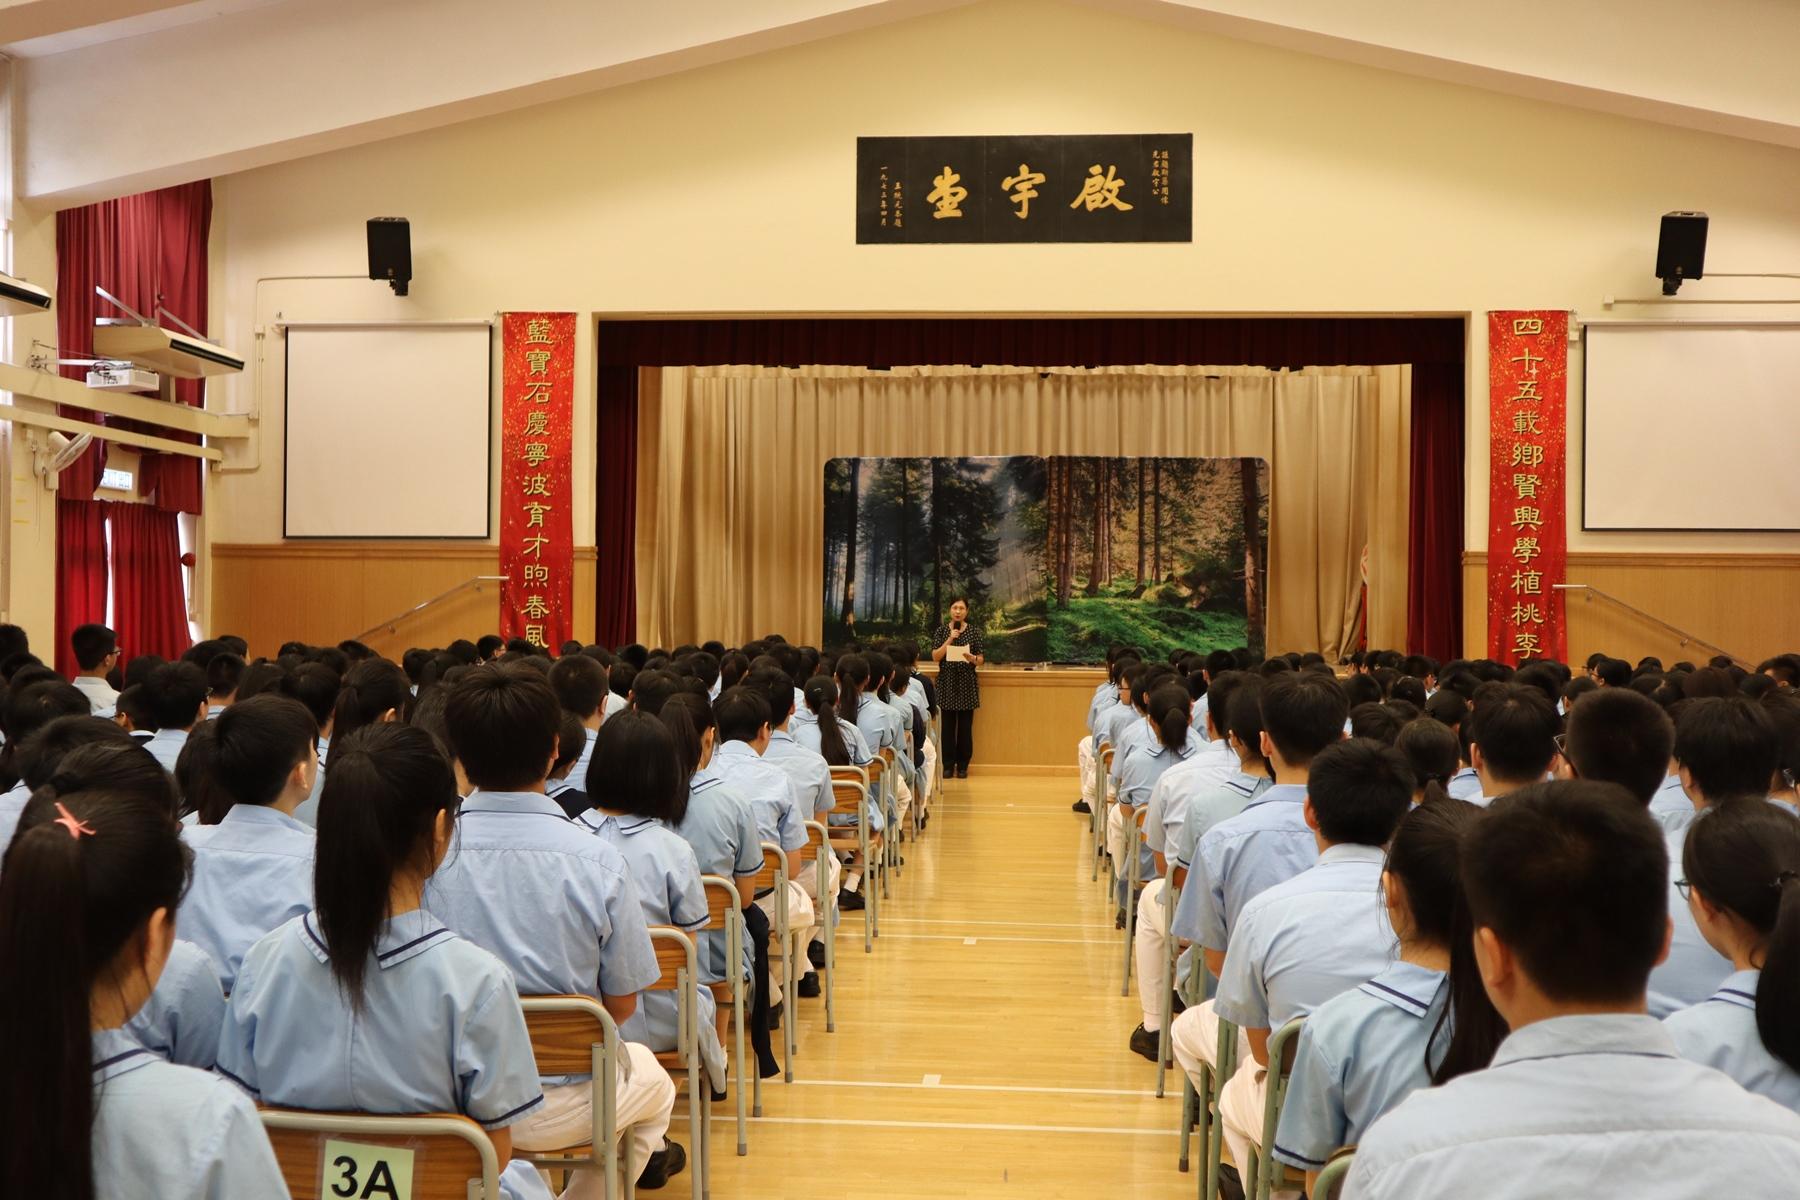 https://npc.edu.hk/sites/default/files/img_9142_2.jpg